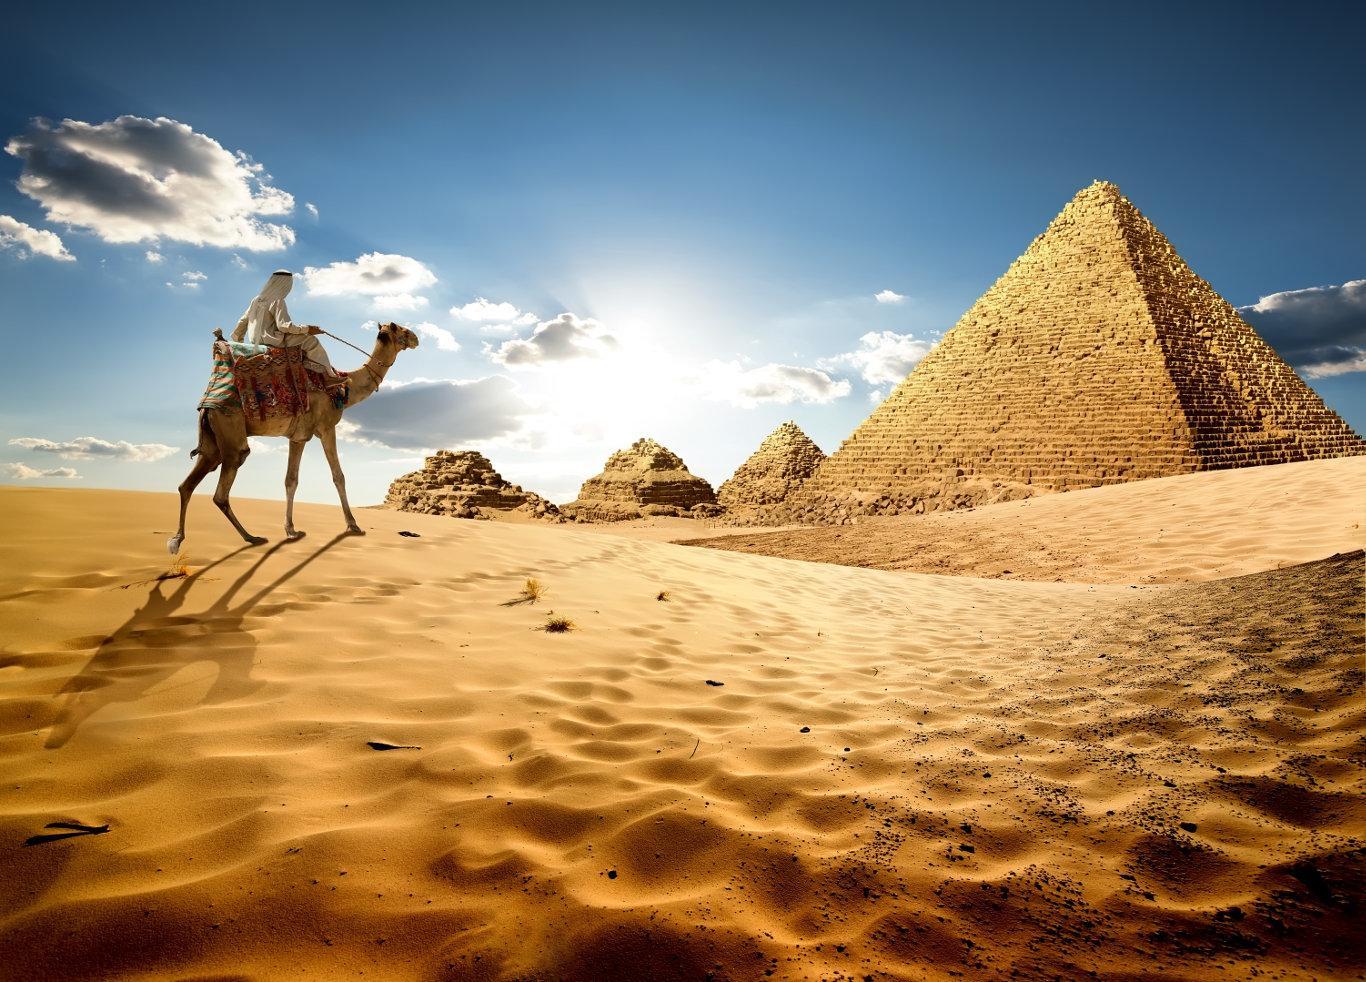 http://admin.playayciudad.com/assets/galeria/EGIPTO_BASICO_ABUSIMBEL_CAMELLO.jpg